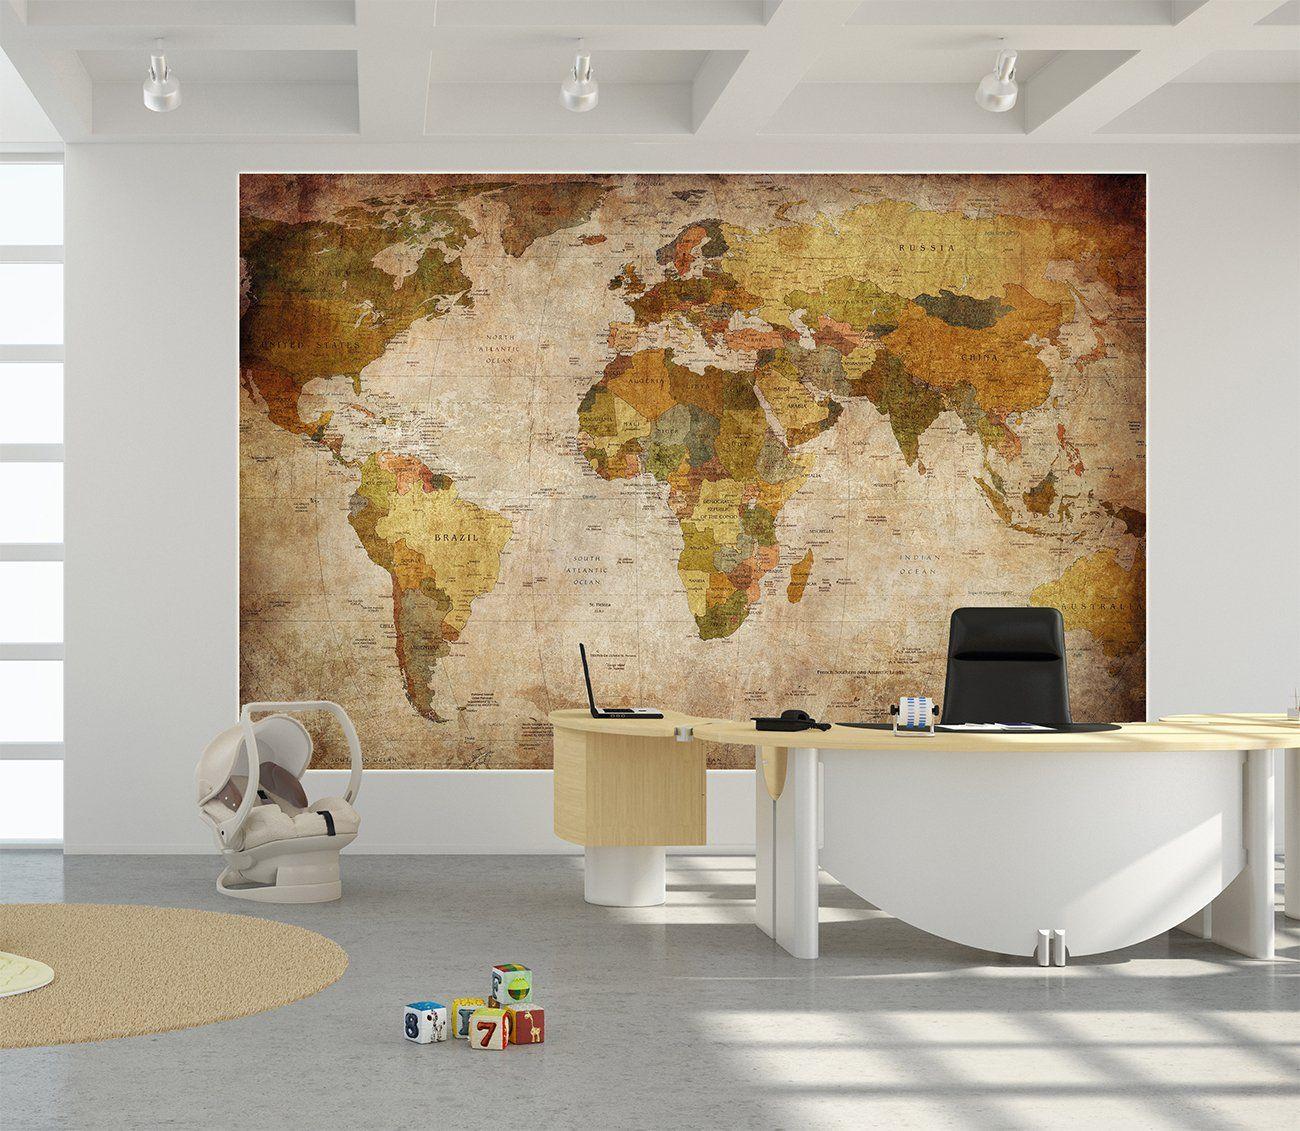 Amazon world map photo wallpaper vintage retro motif xxl amazon world map photo wallpaper vintage retro motif xxl world map mural wall decoration gumiabroncs Choice Image